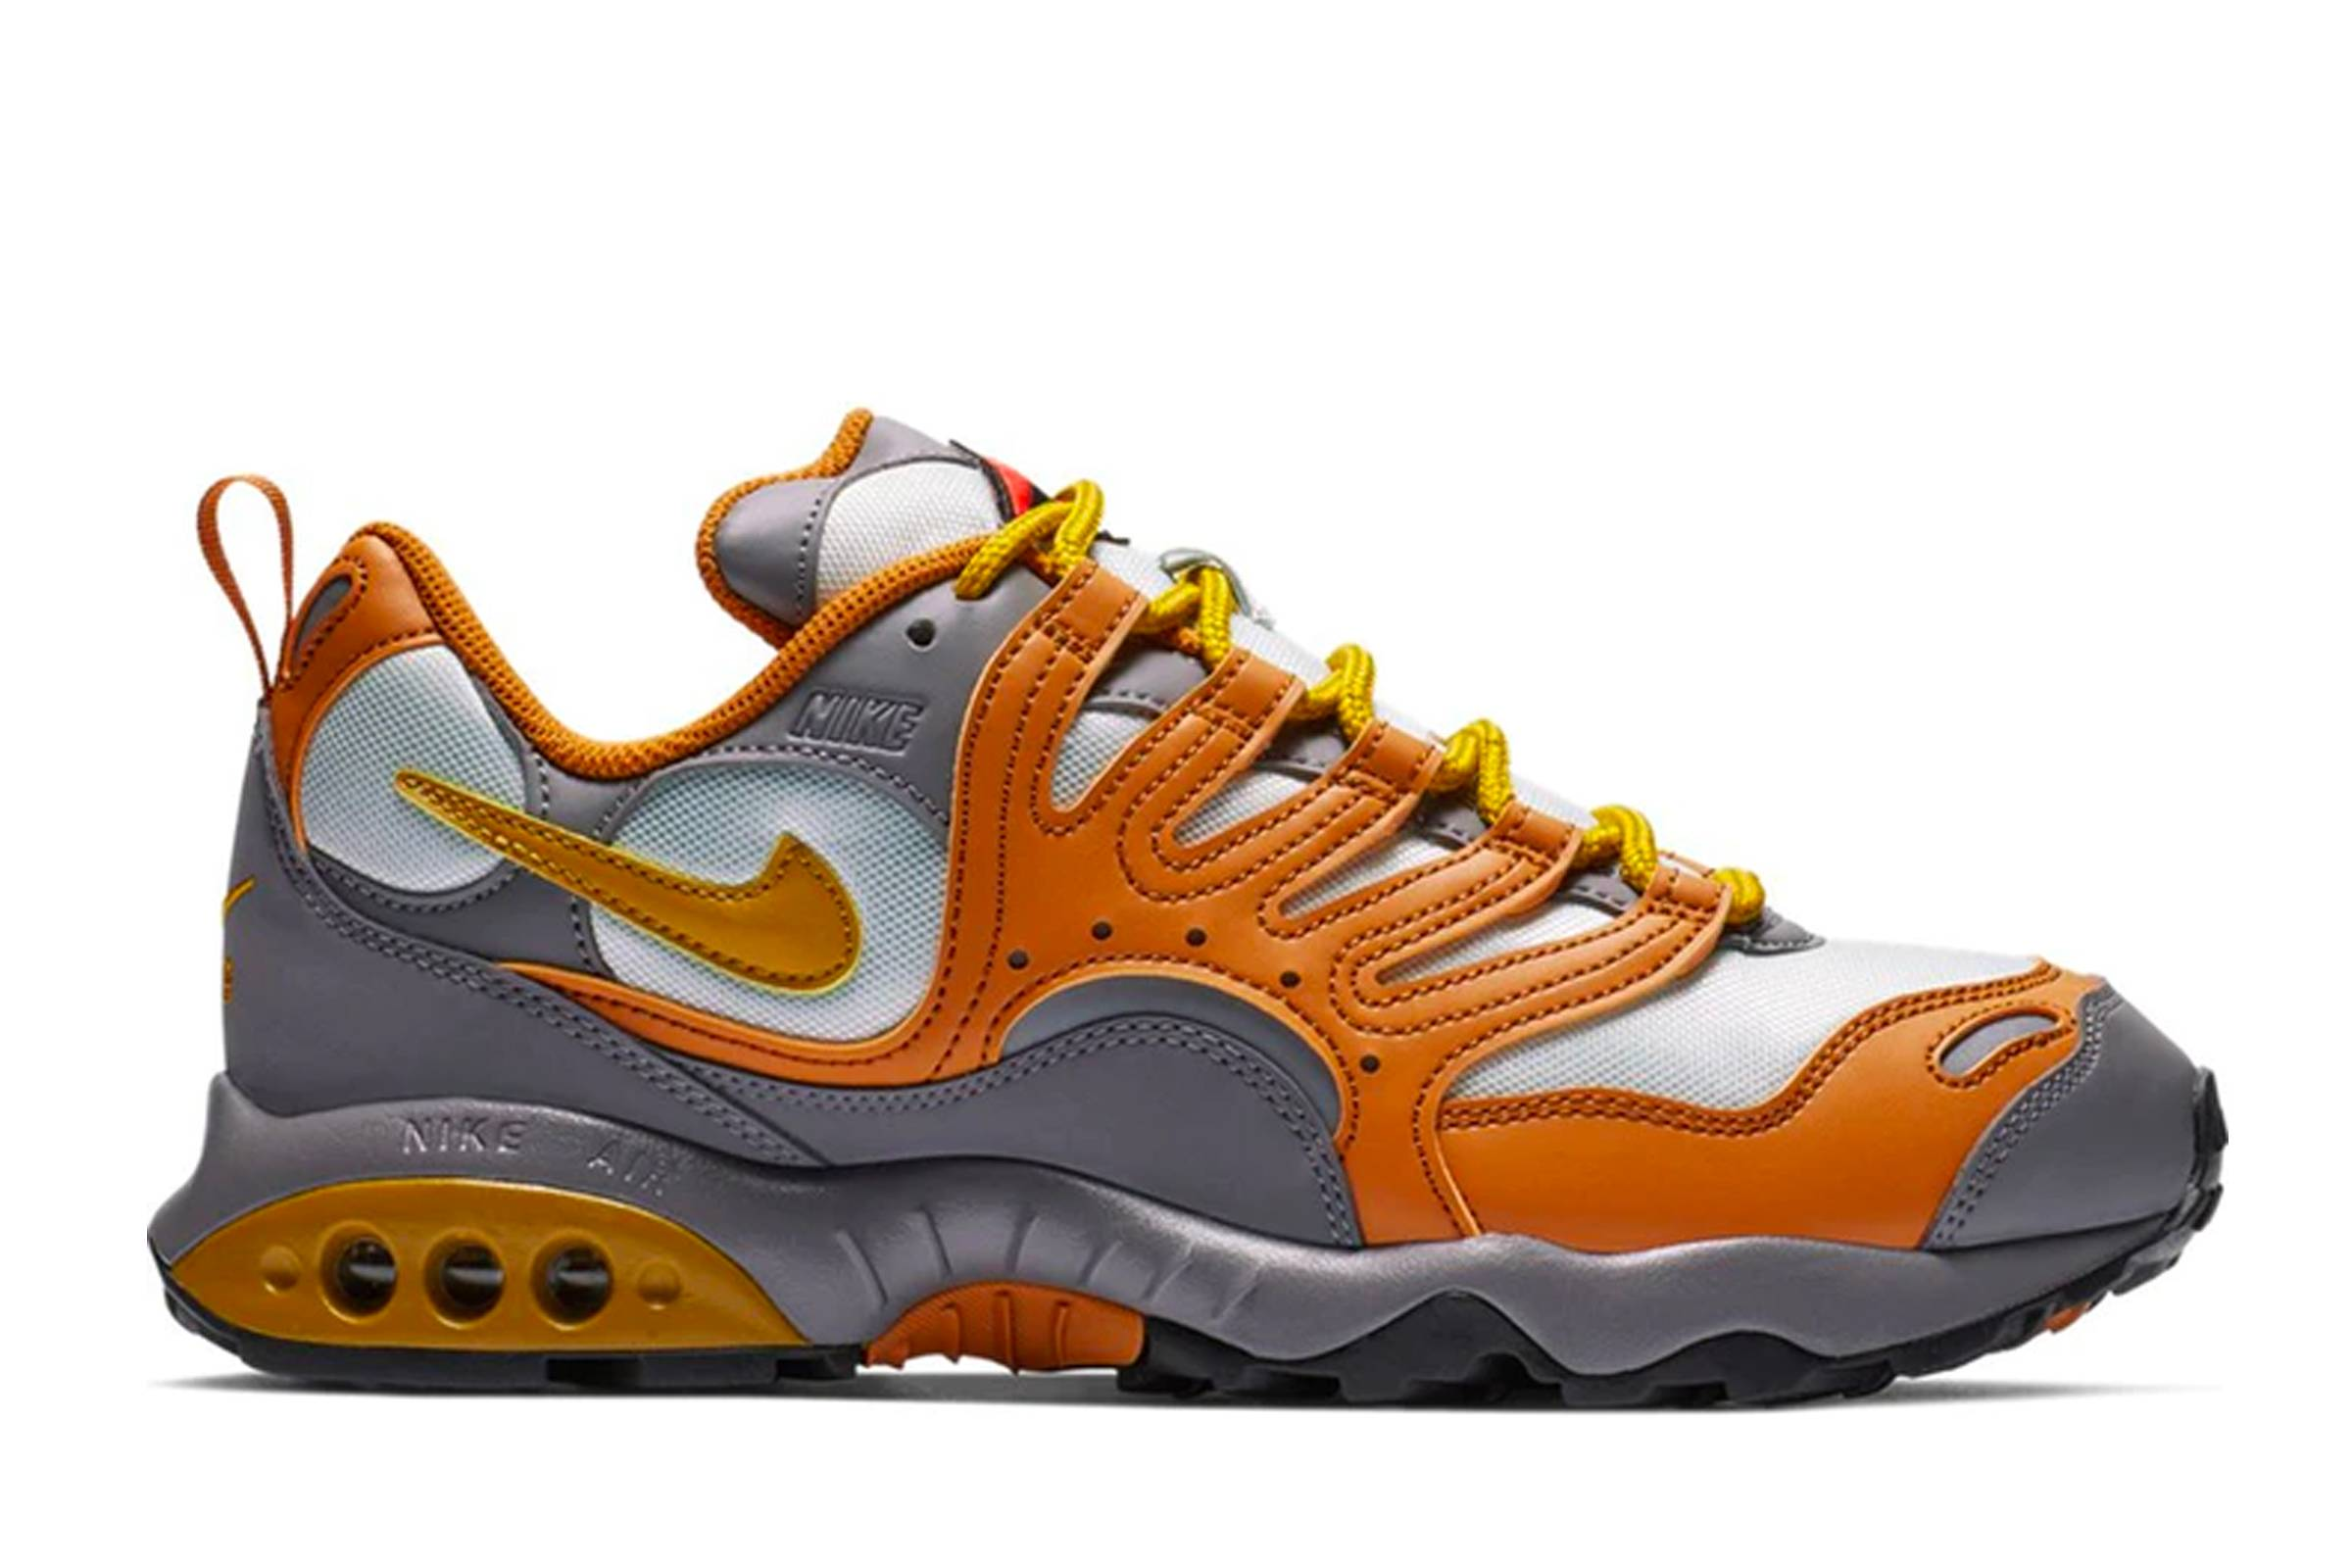 Nike Terra Humara